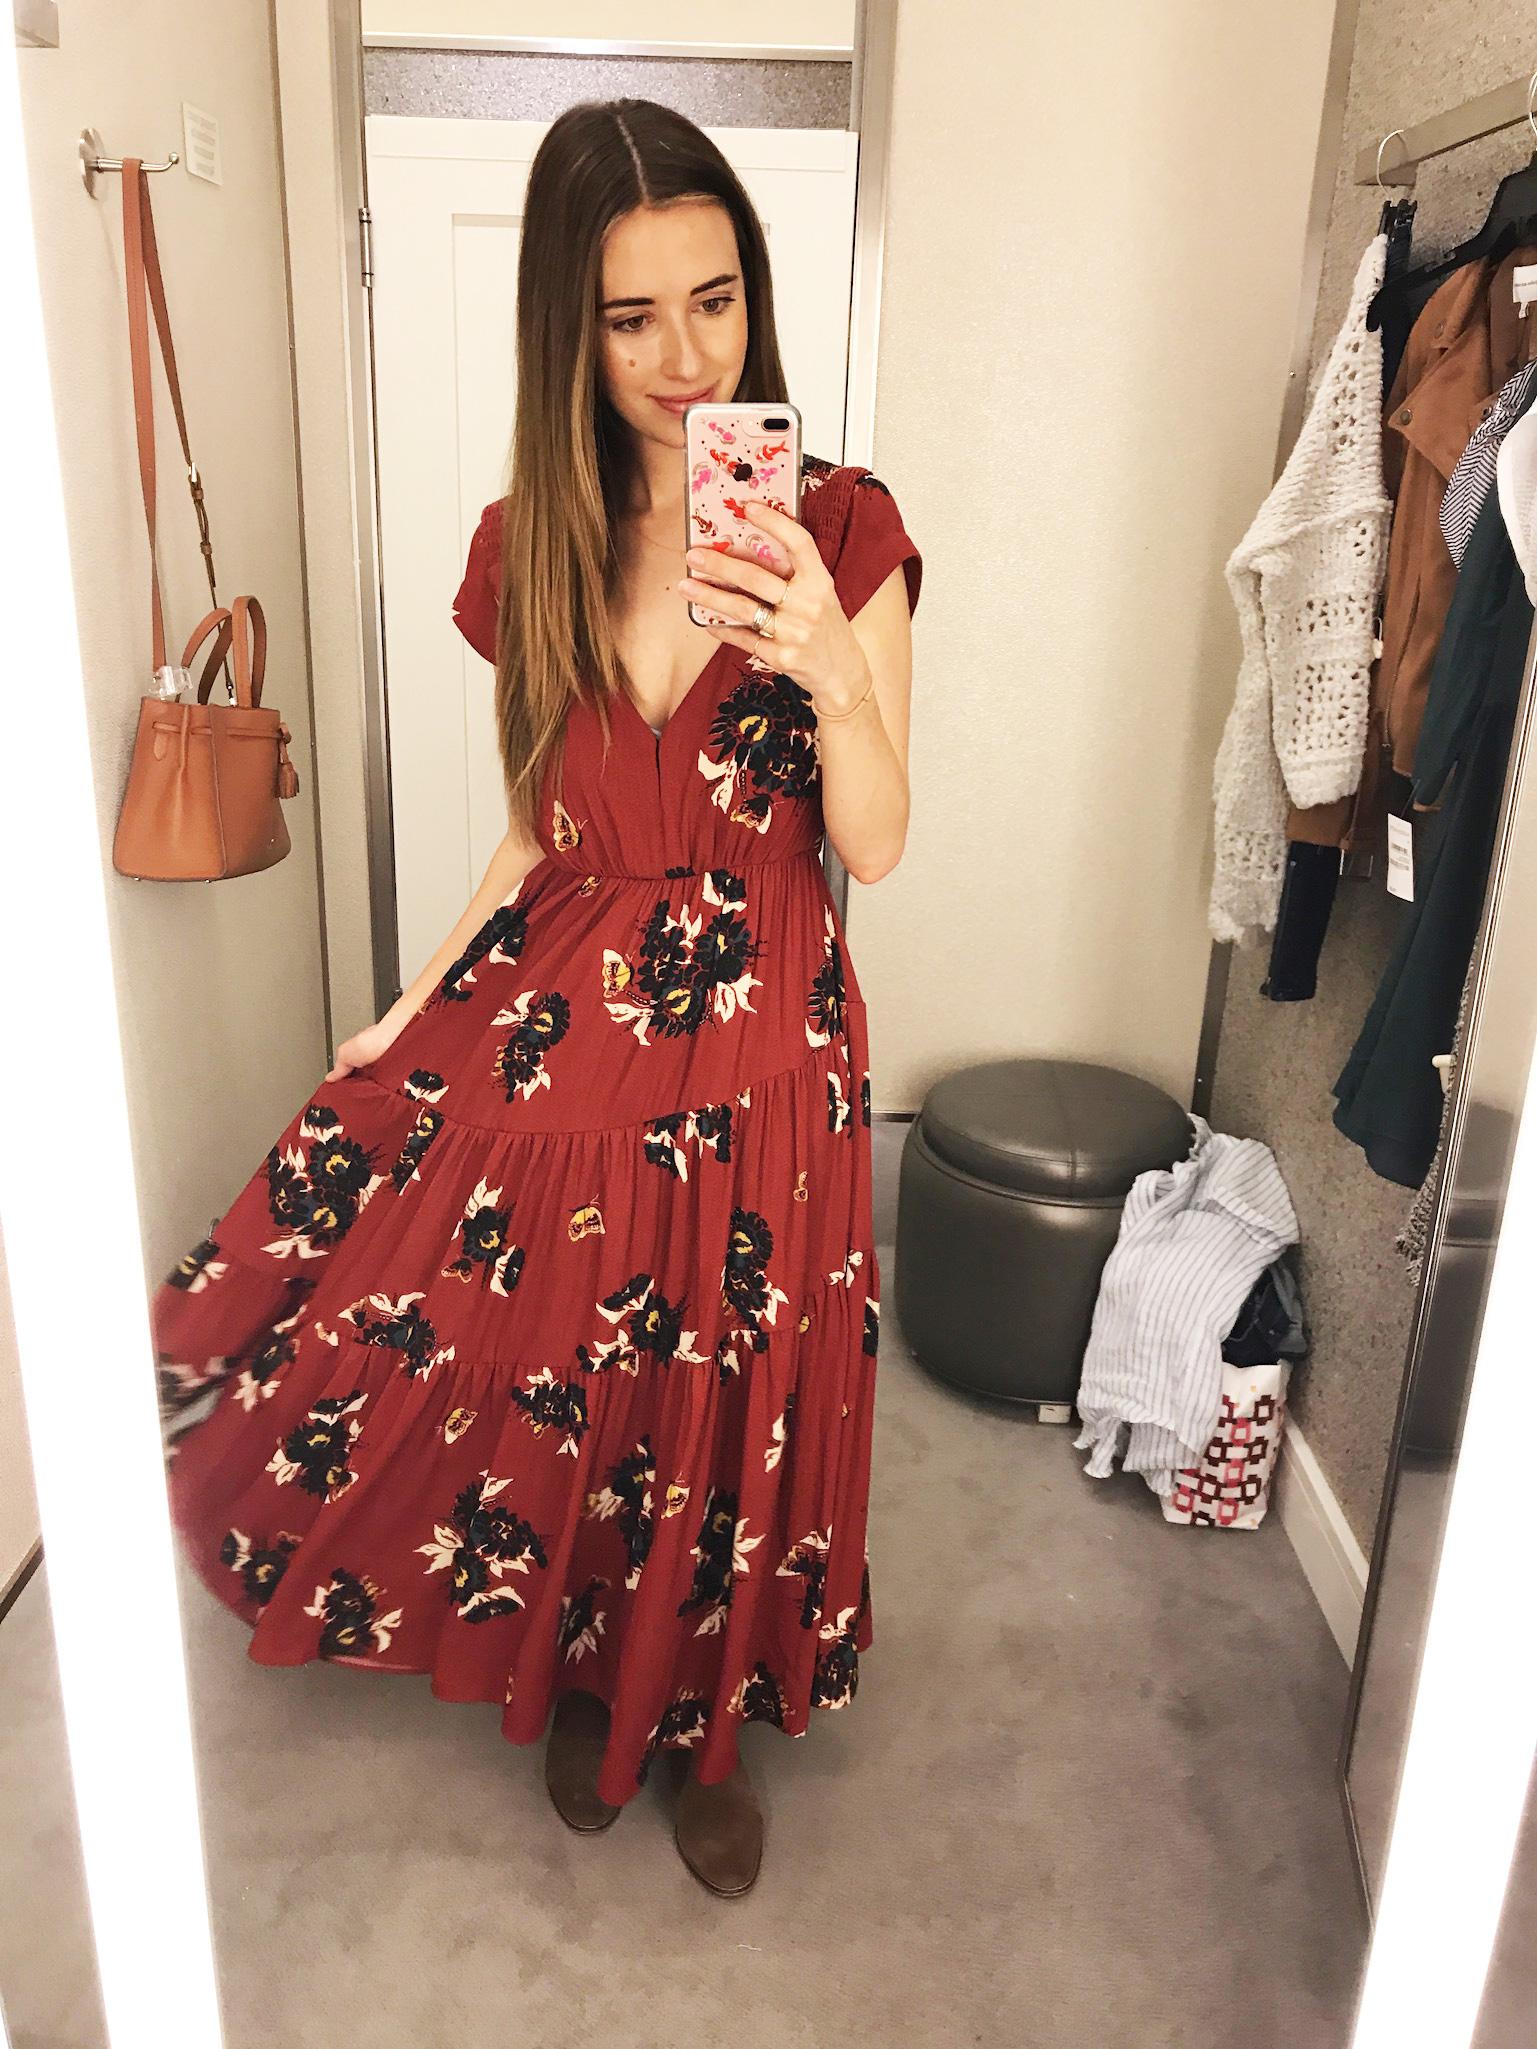 Dressing Room Diary Post - M Loves M @marmar